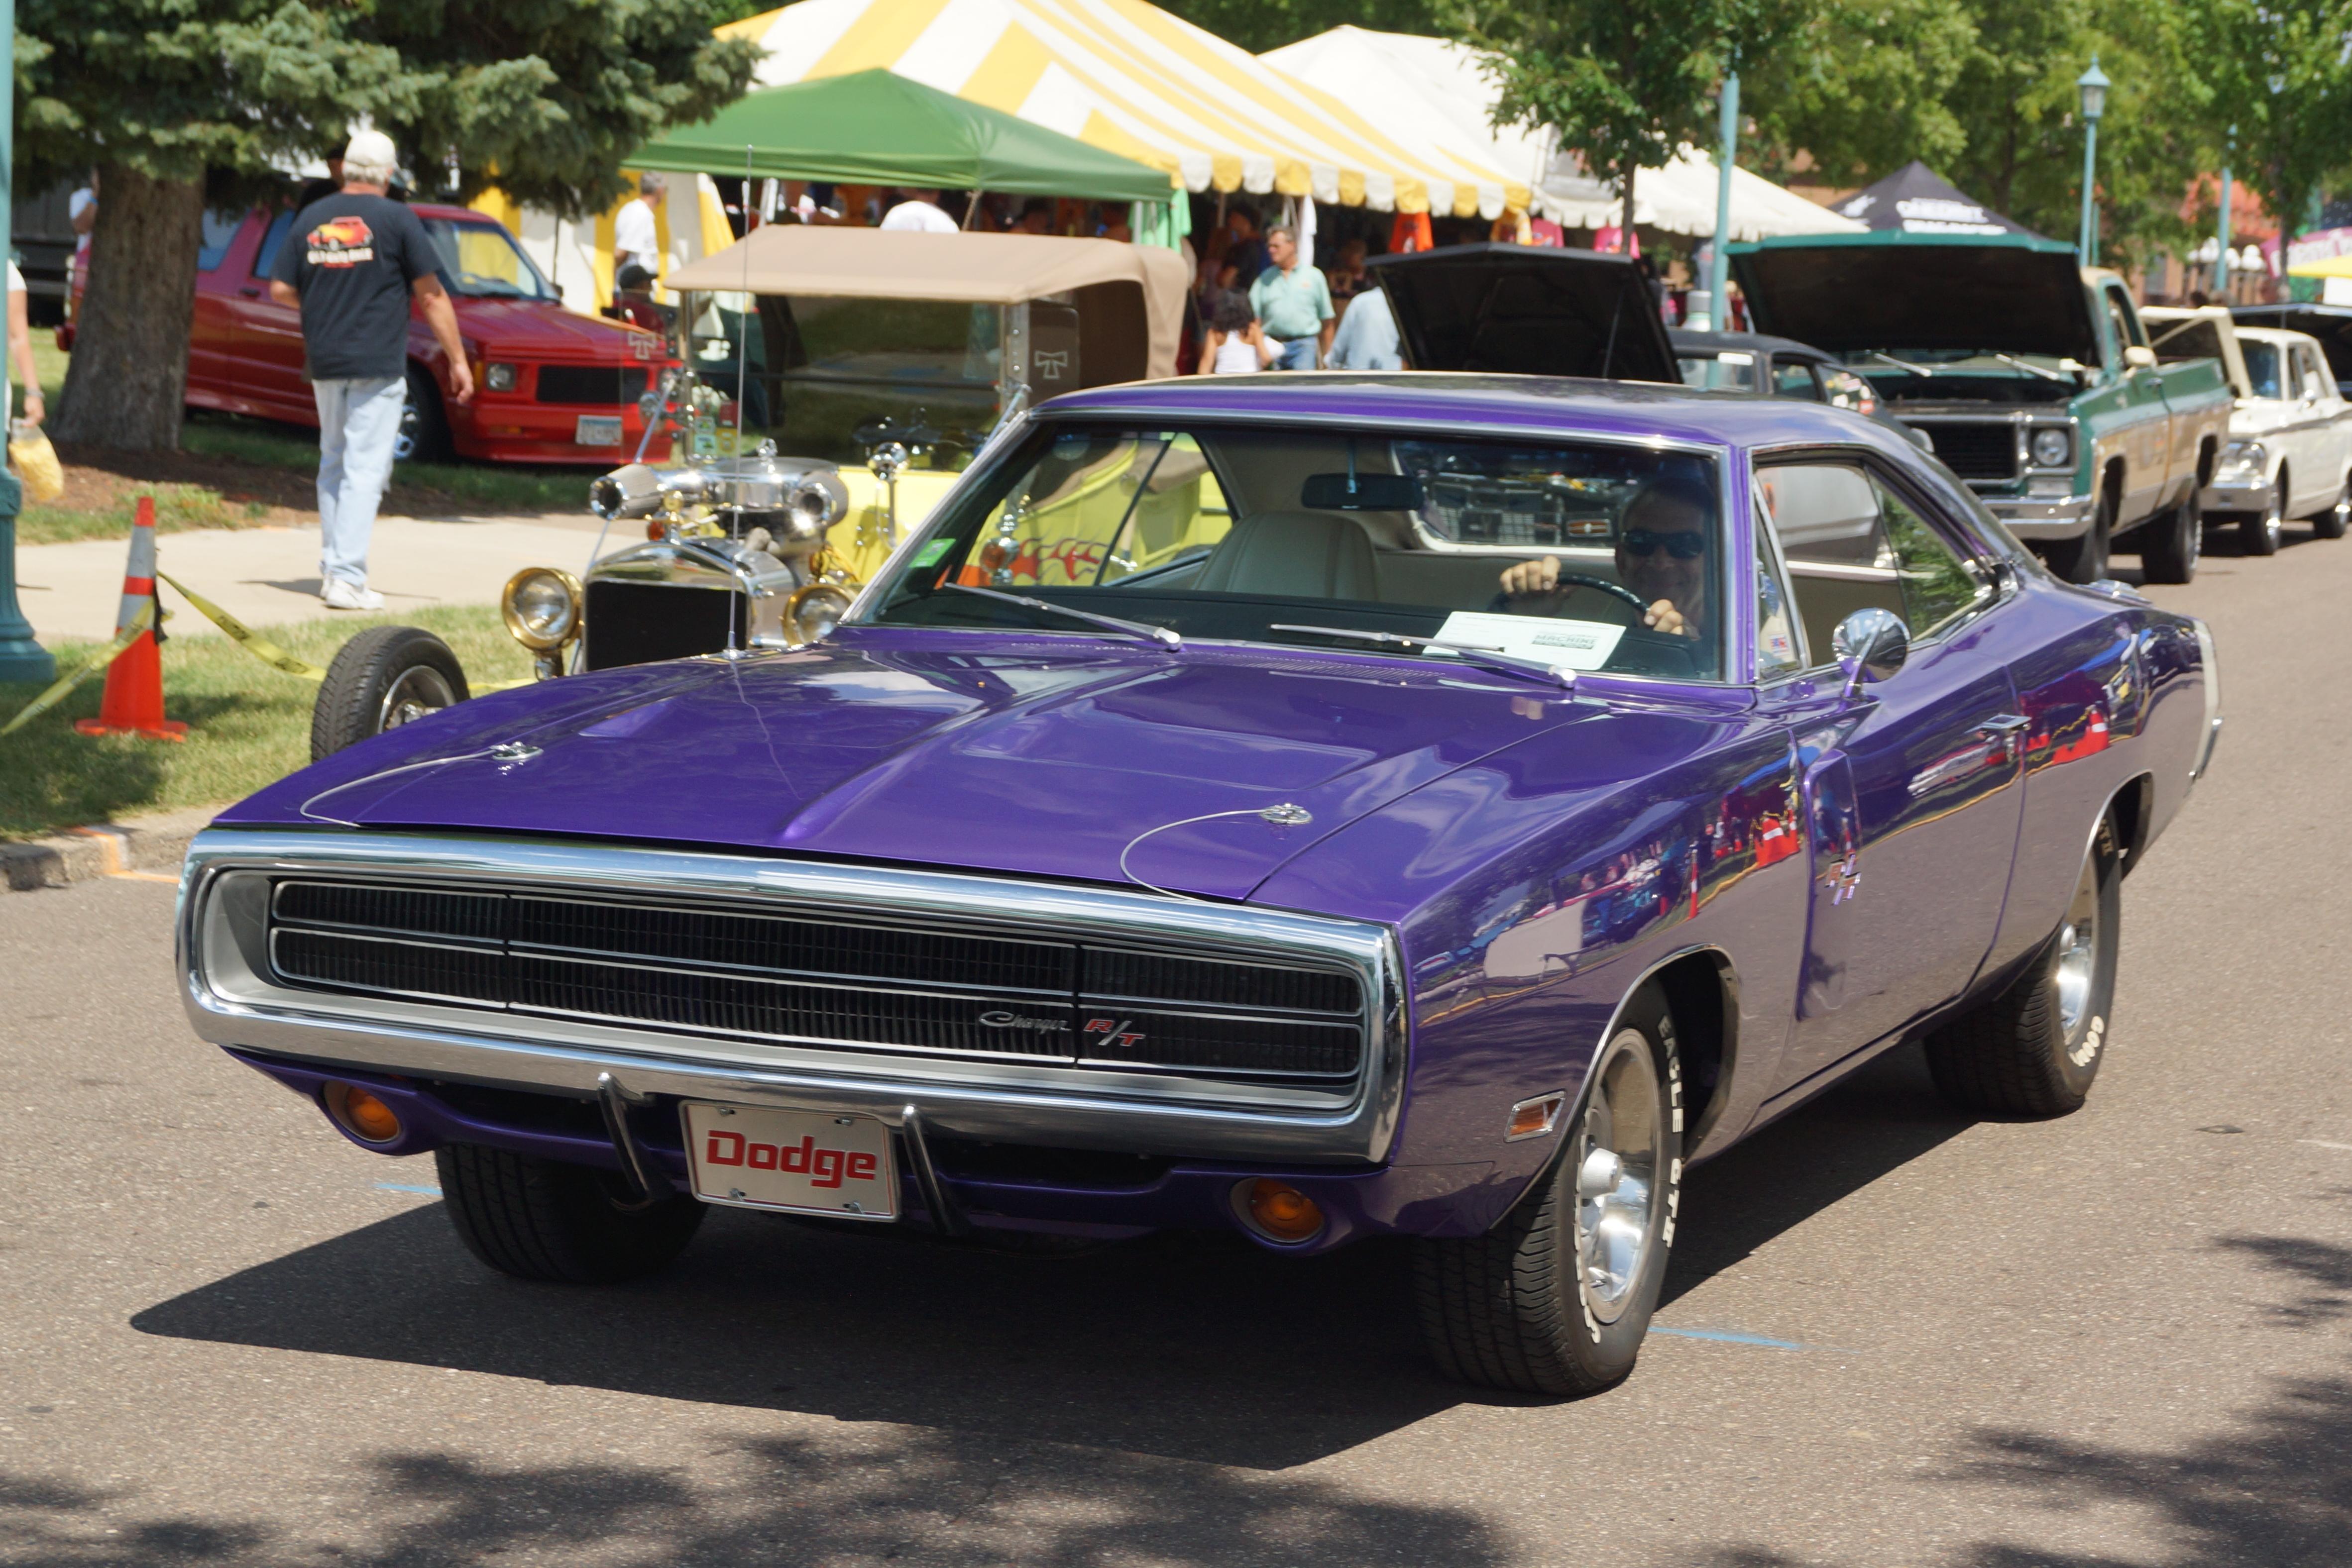 File:1970 Dodge Charger R-T (28263956642).jpg